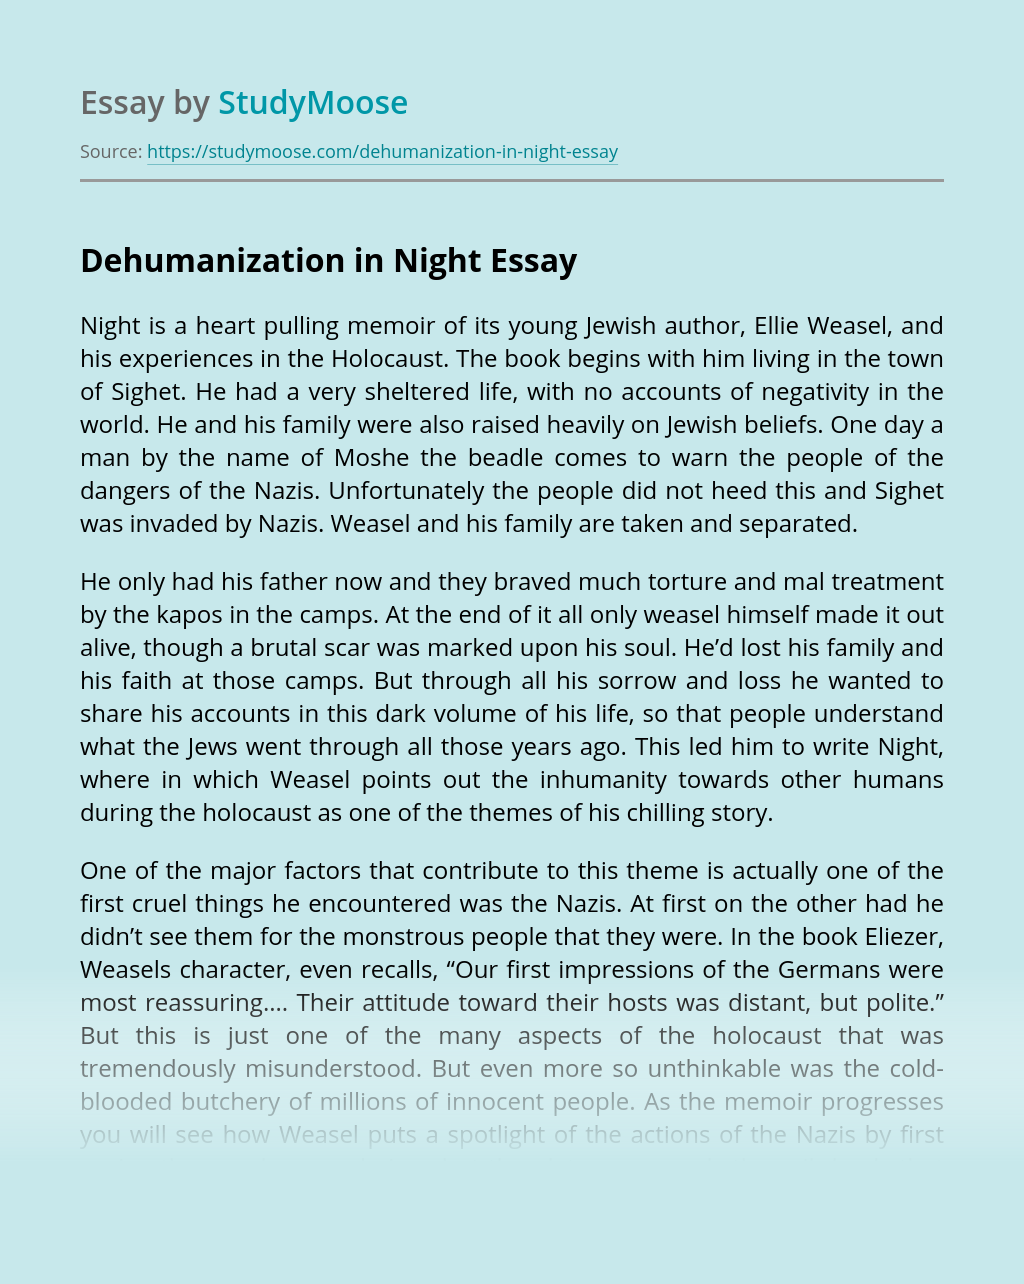 Dehumanization in Night